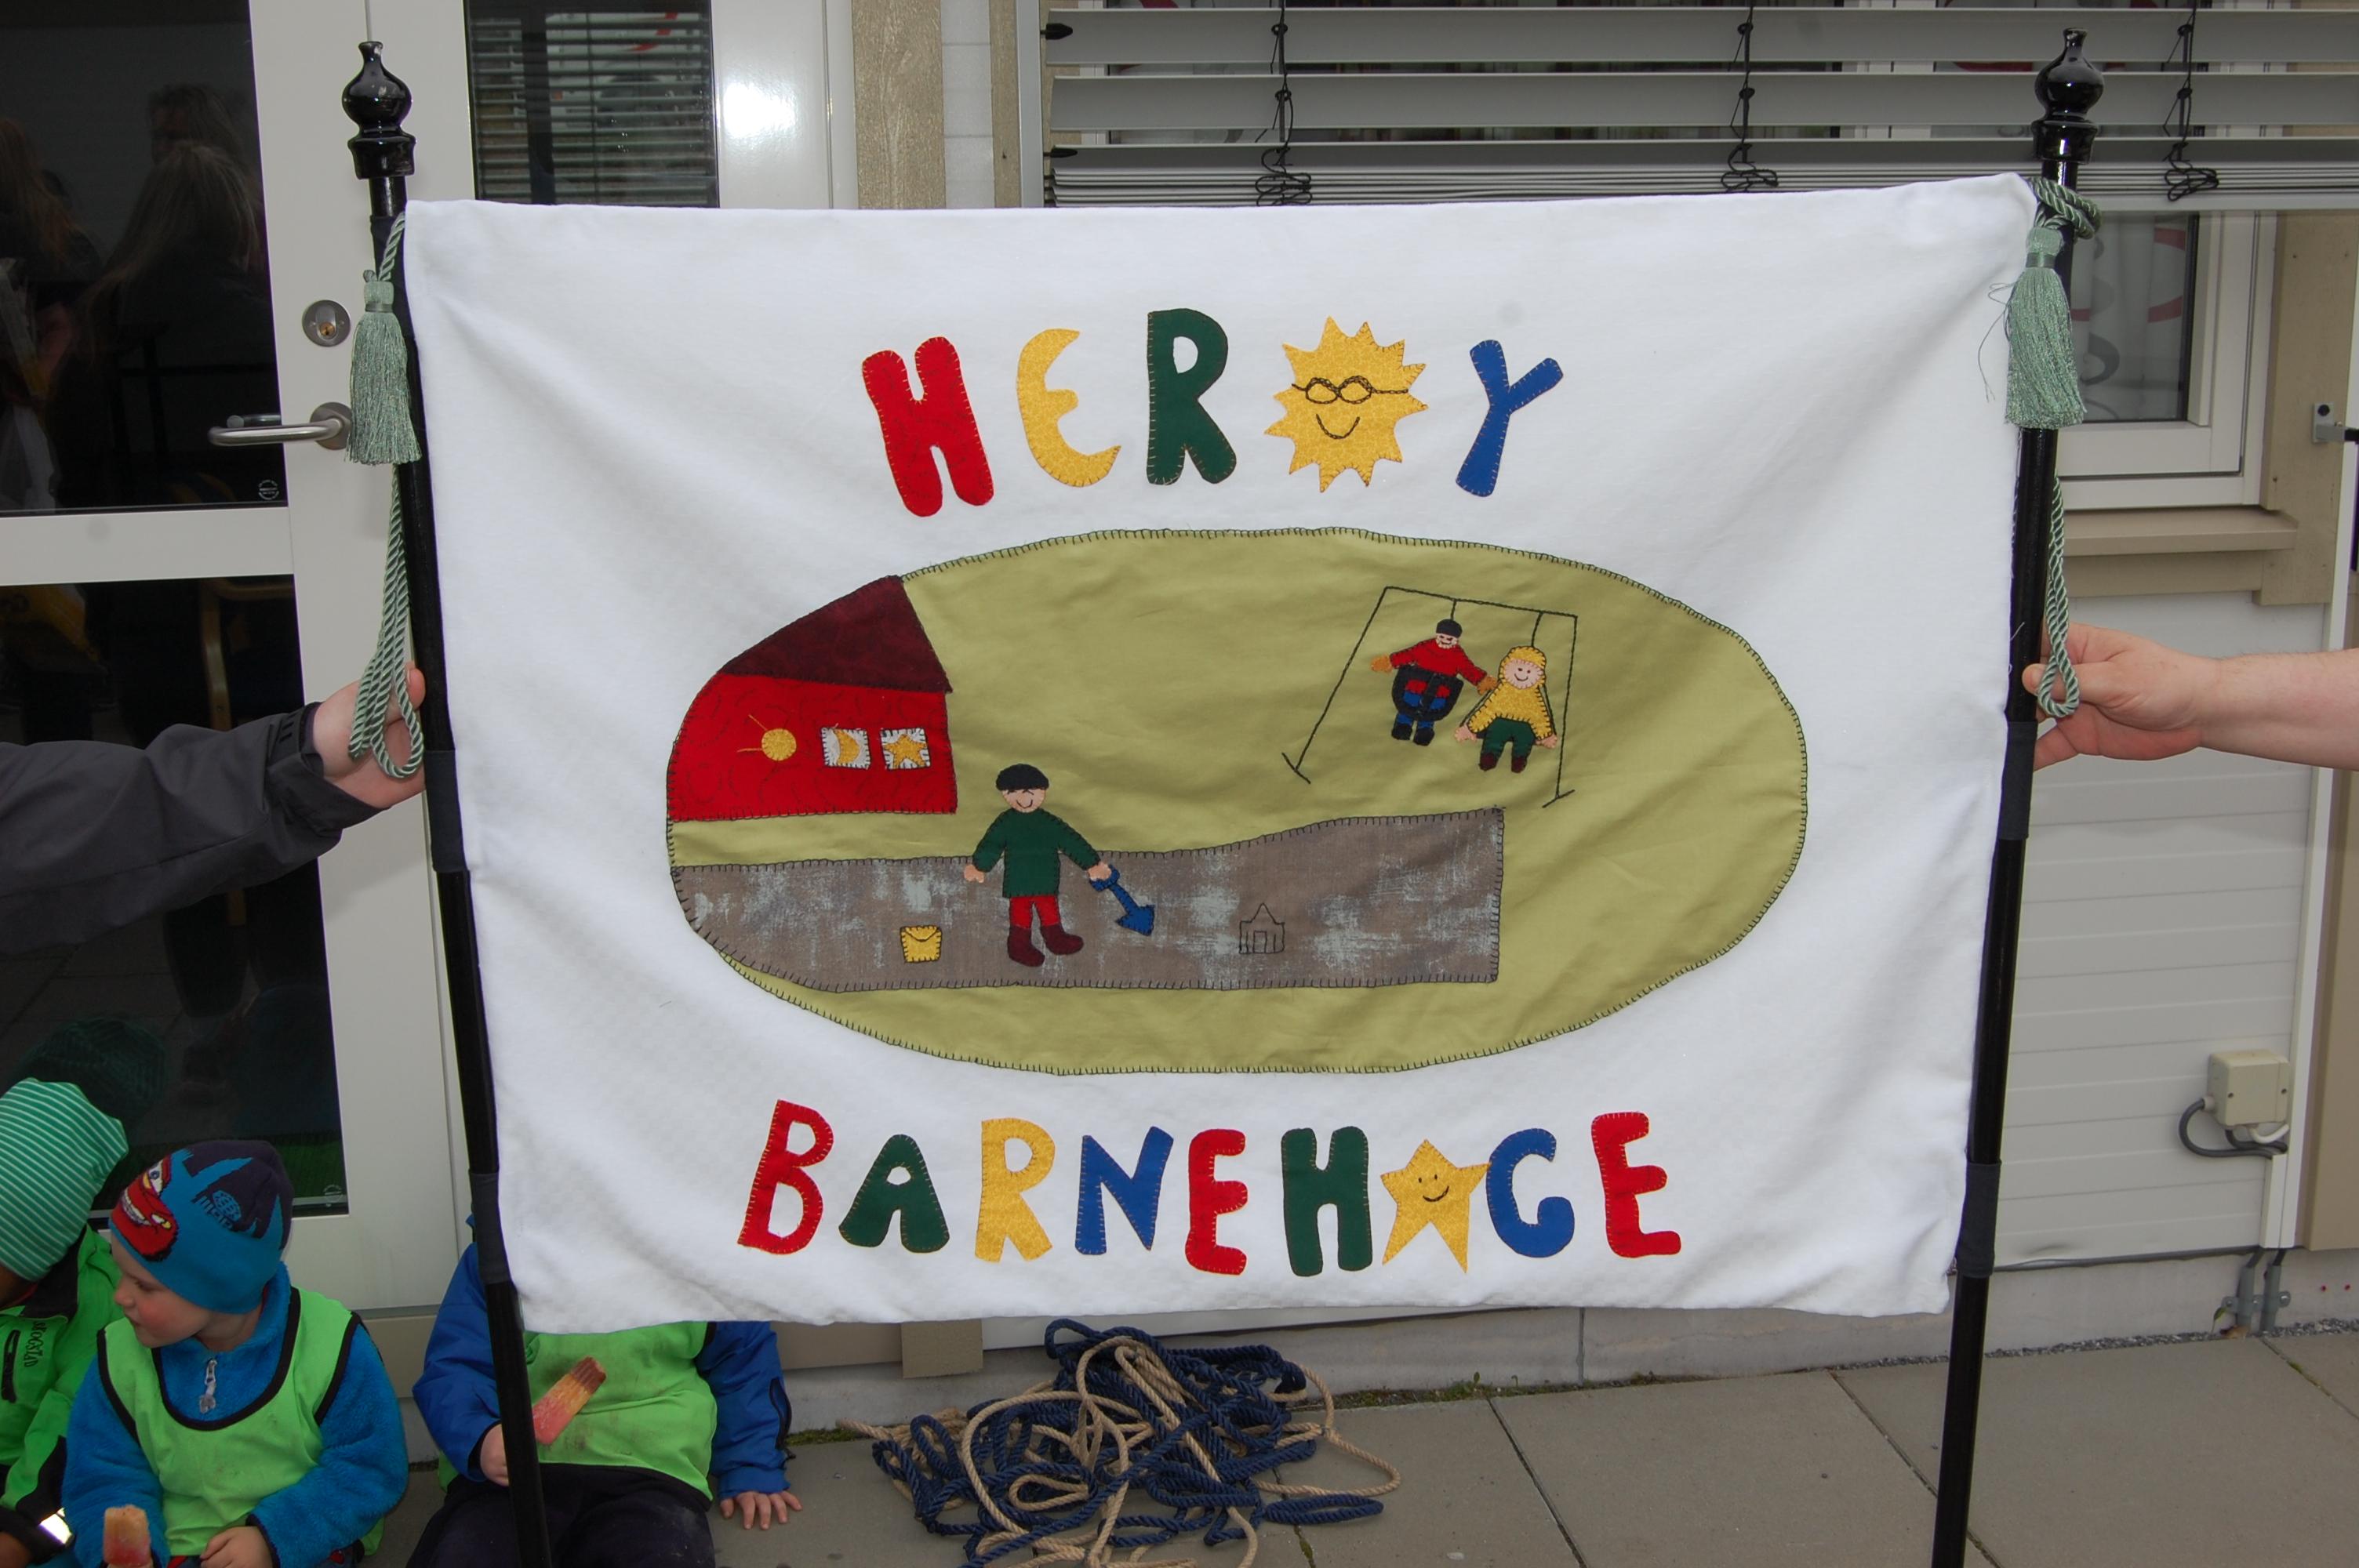 Heroey_barnehage_radhus3